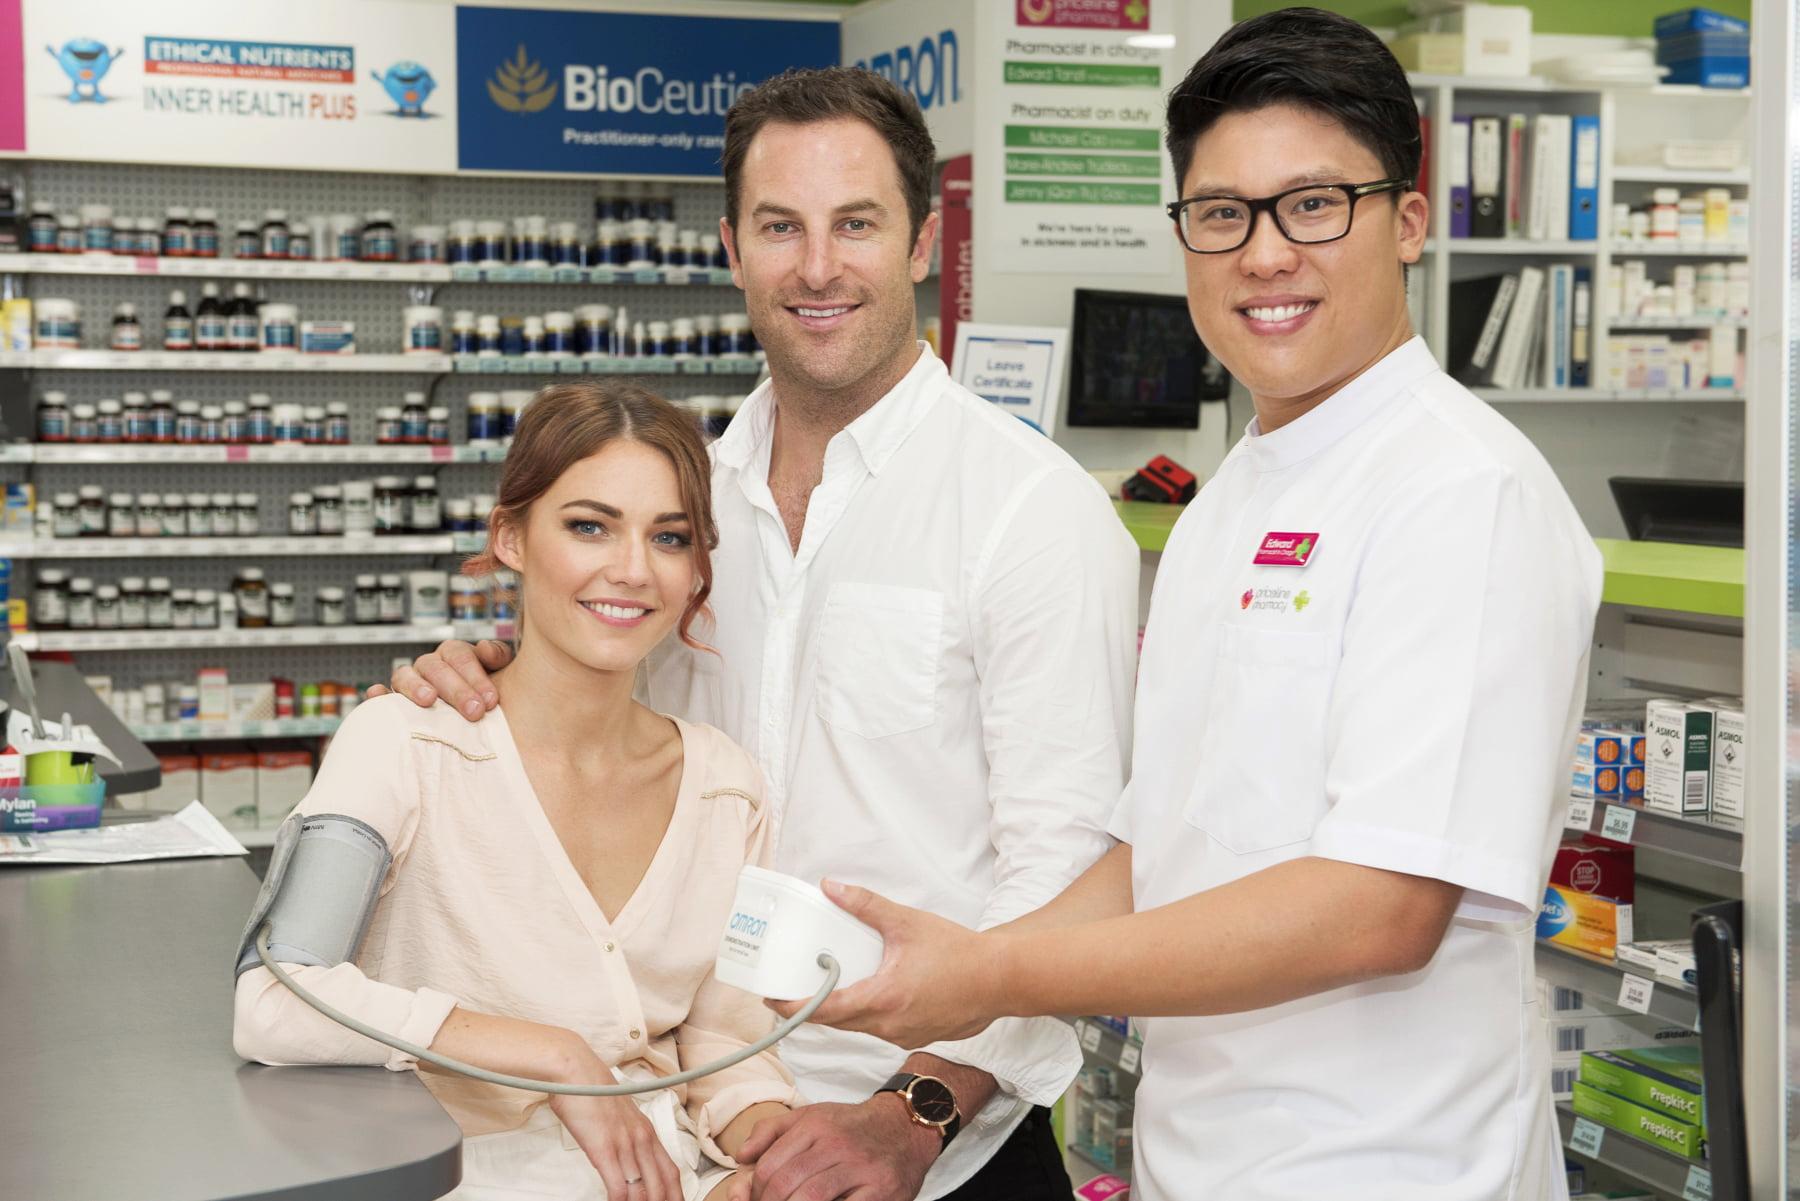 Sam Frost and Sasha Mielczarek in-store with Priceline Pharmacist, Ed Tanzil.